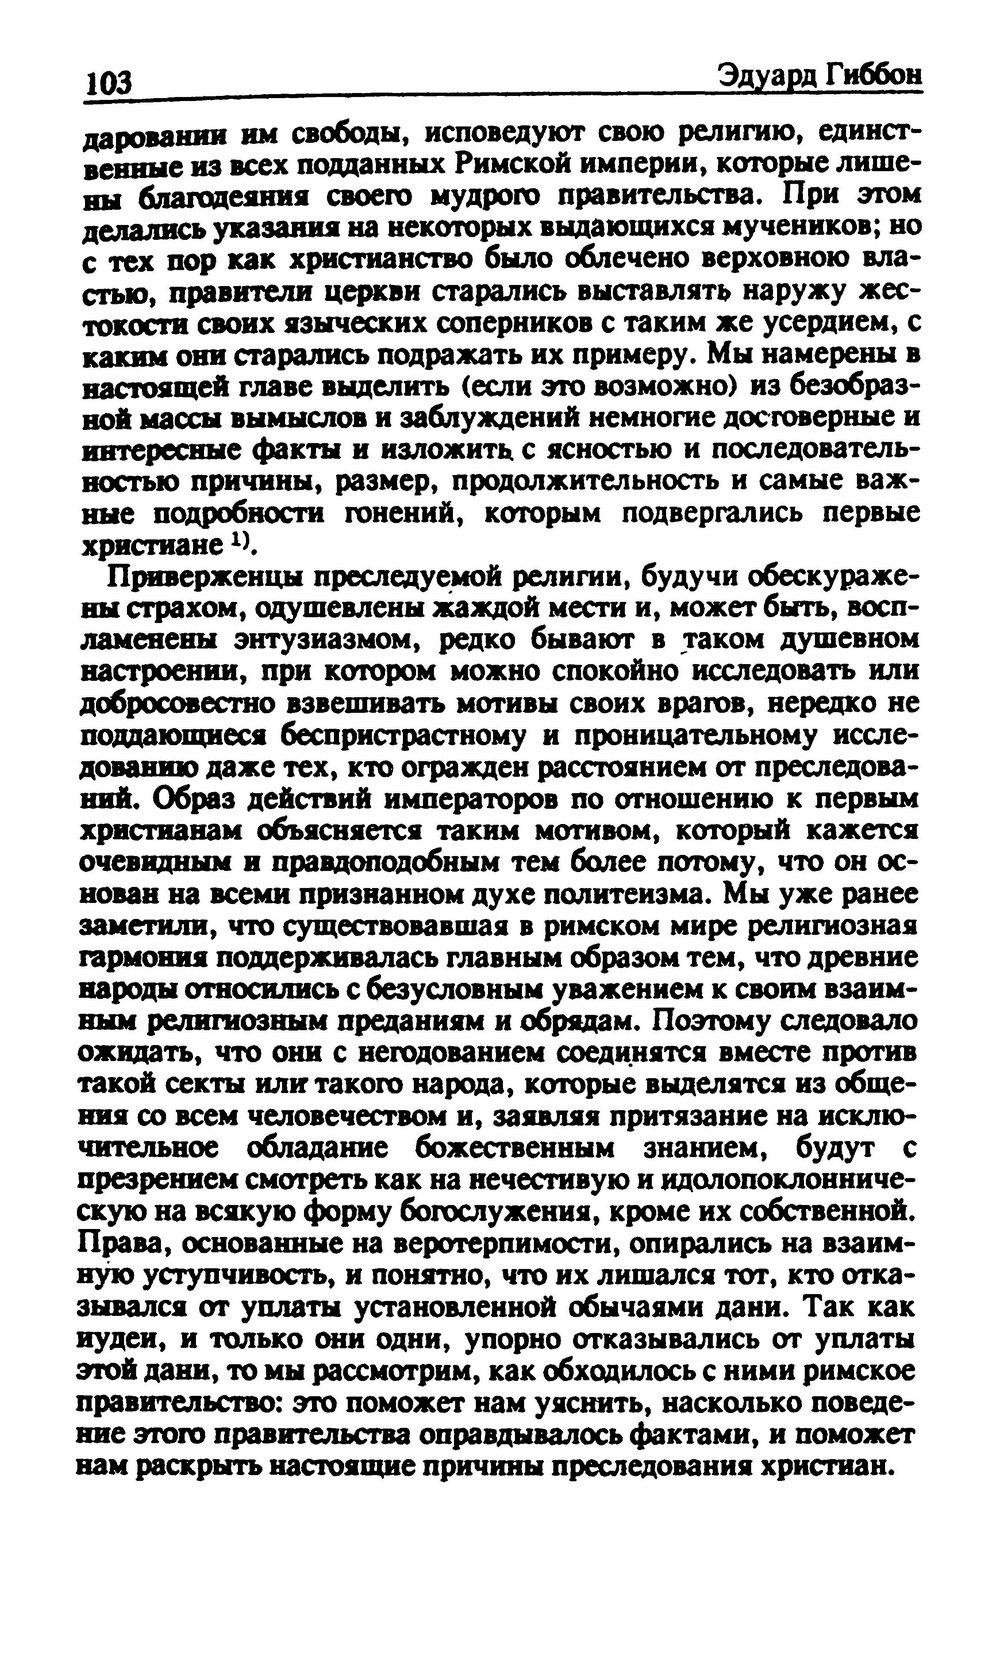 http://images.vfl.ru/ii/1367417380/ab5fc929/2258638.jpg